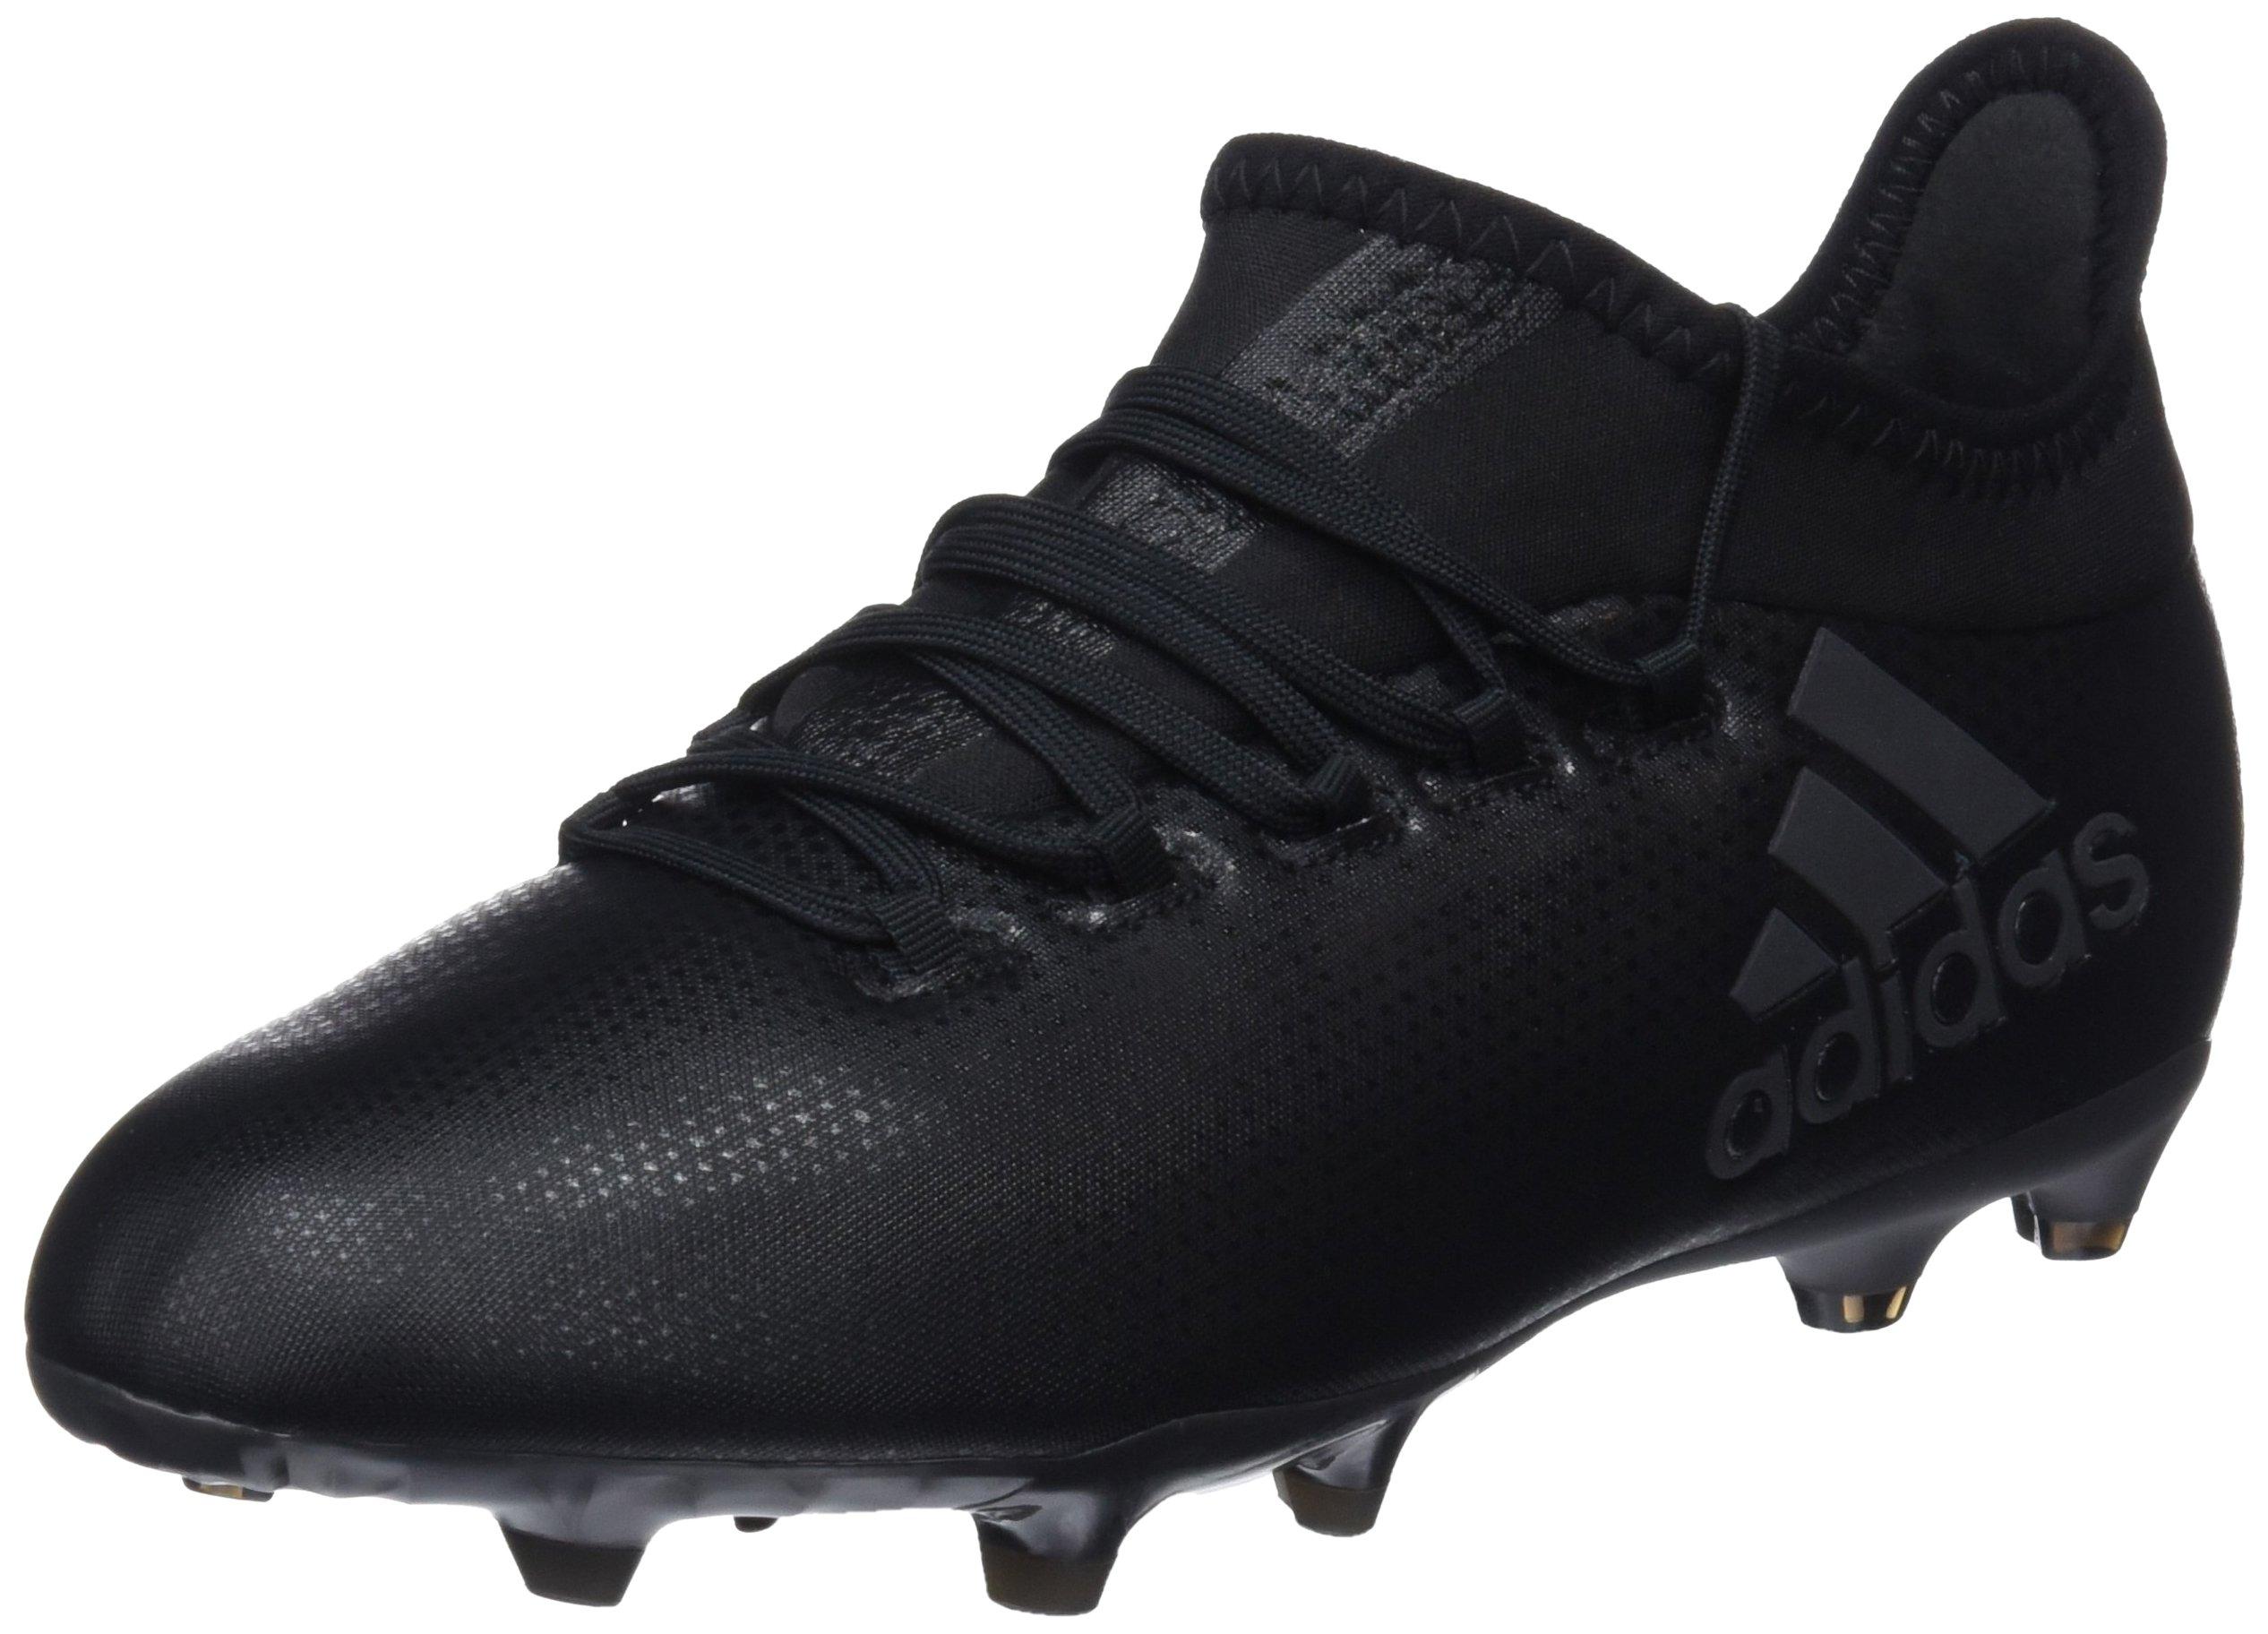 adidas - X 171 FG Junior - CP8979 - Color: Black - Size: 6.0